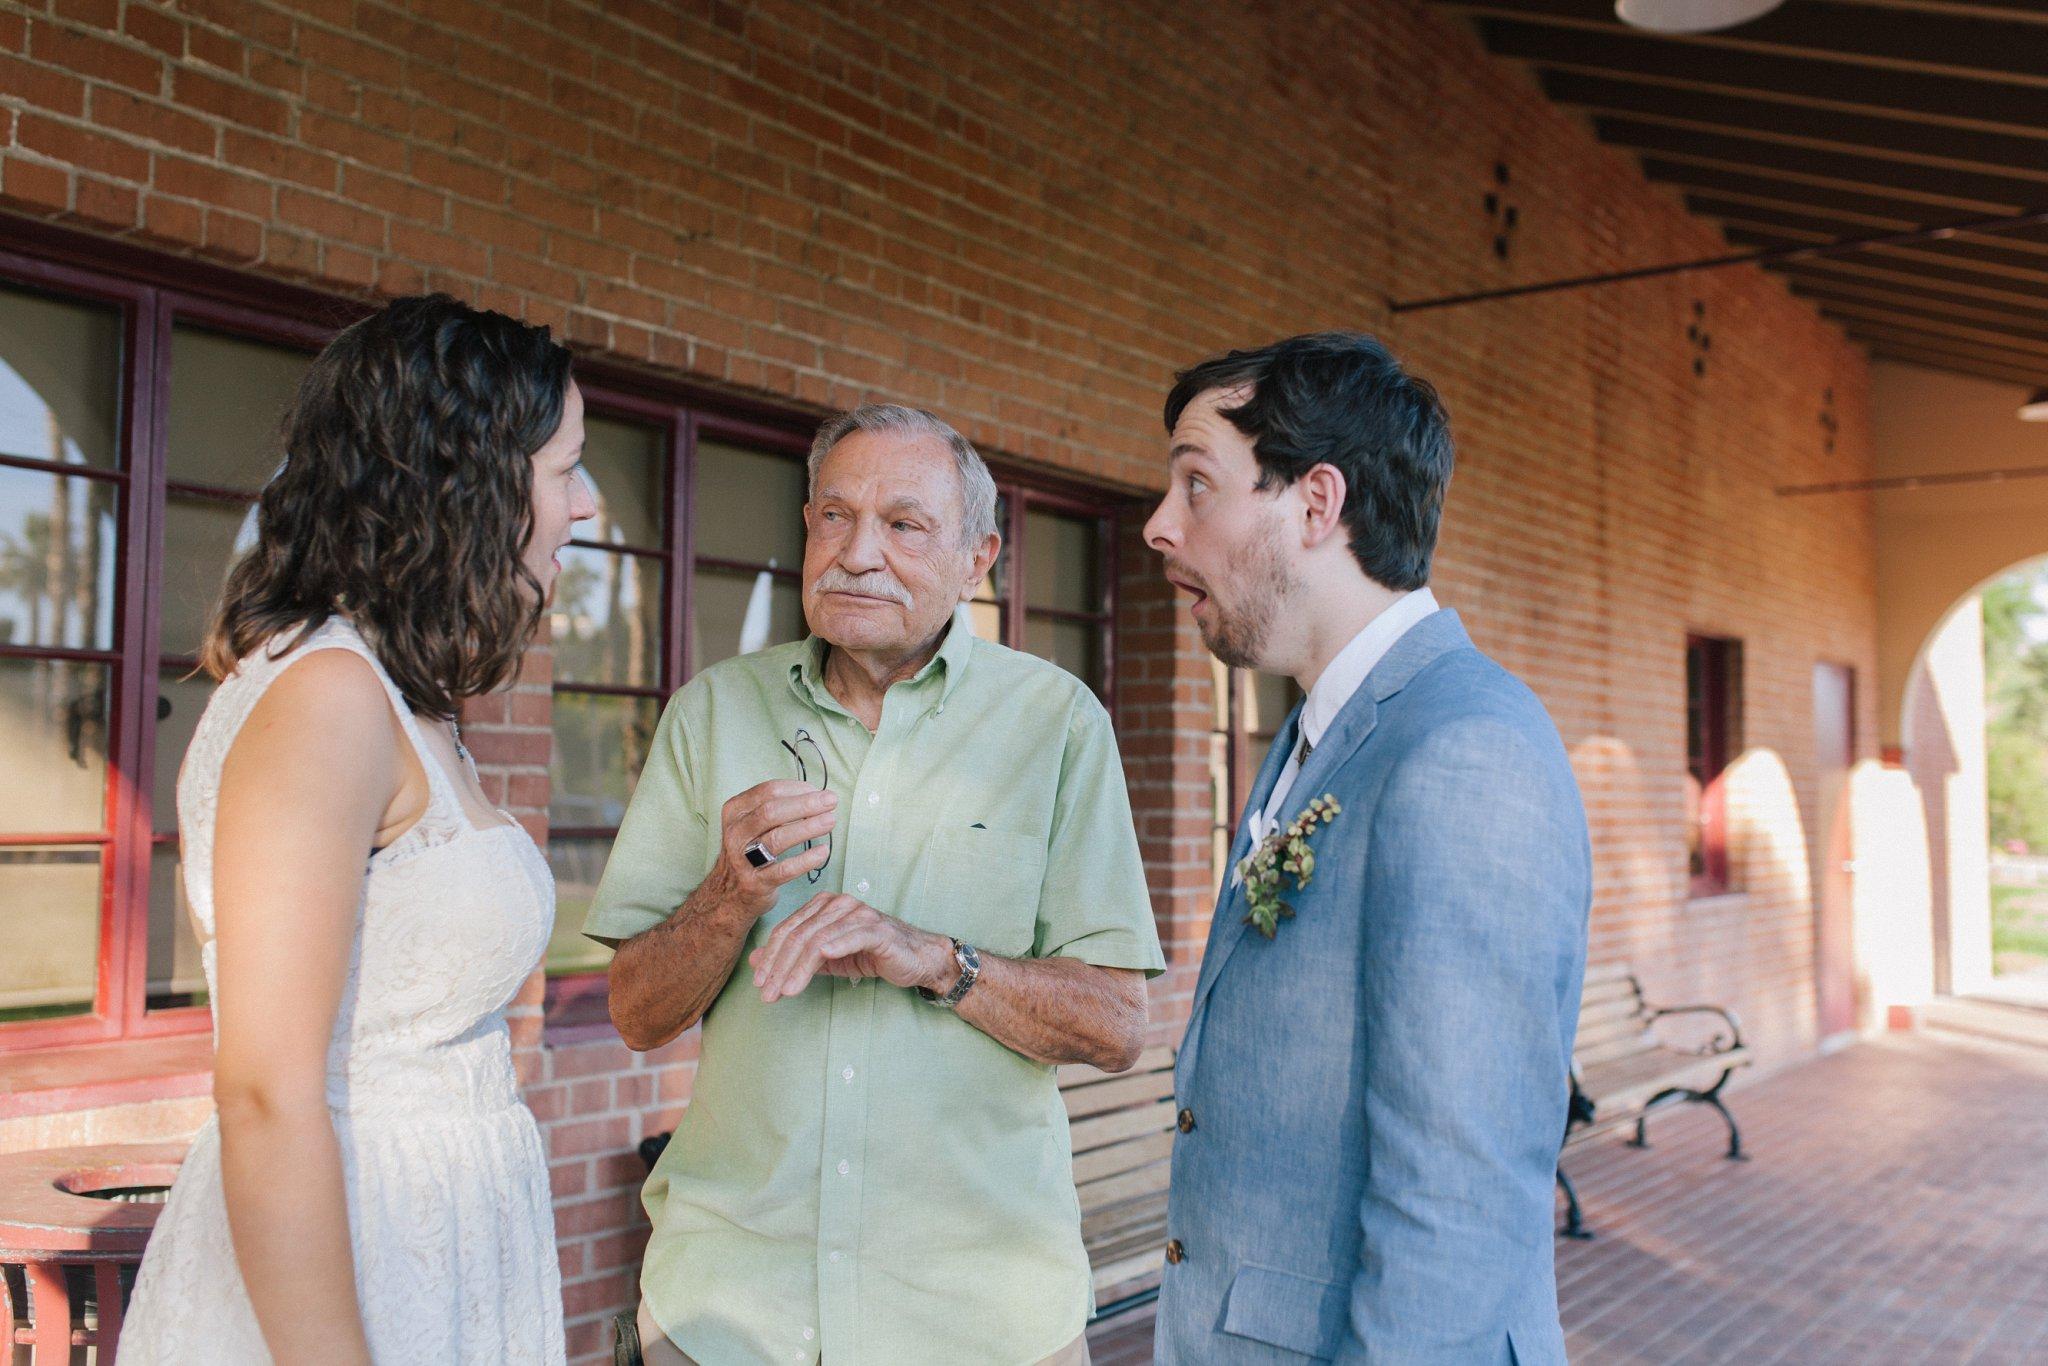 Phoenix Encanto Park wedding documentary candid wedding photography